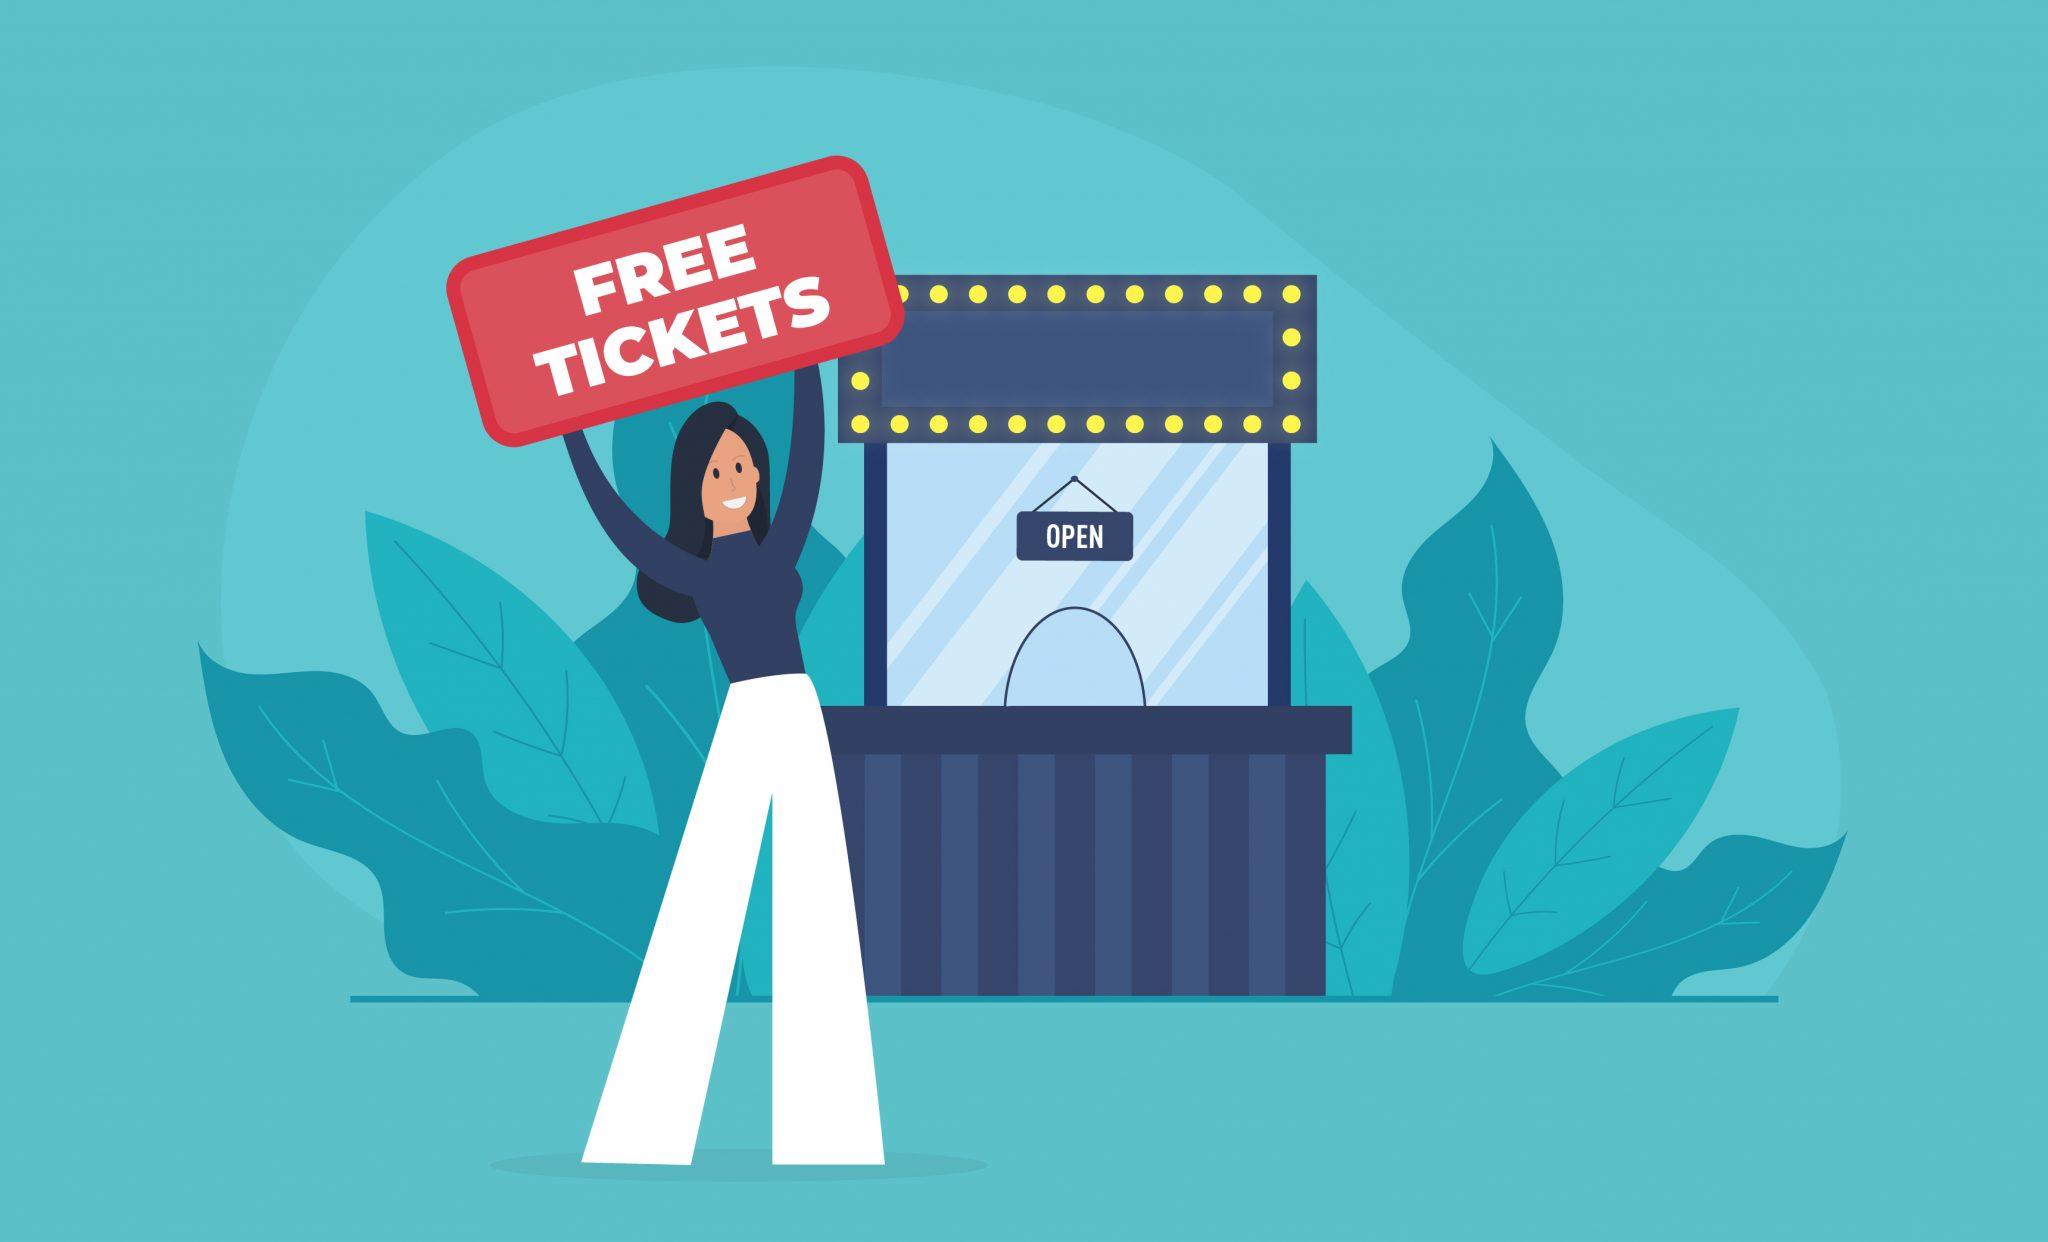 JotForm: The Free Eventbrite Alternative